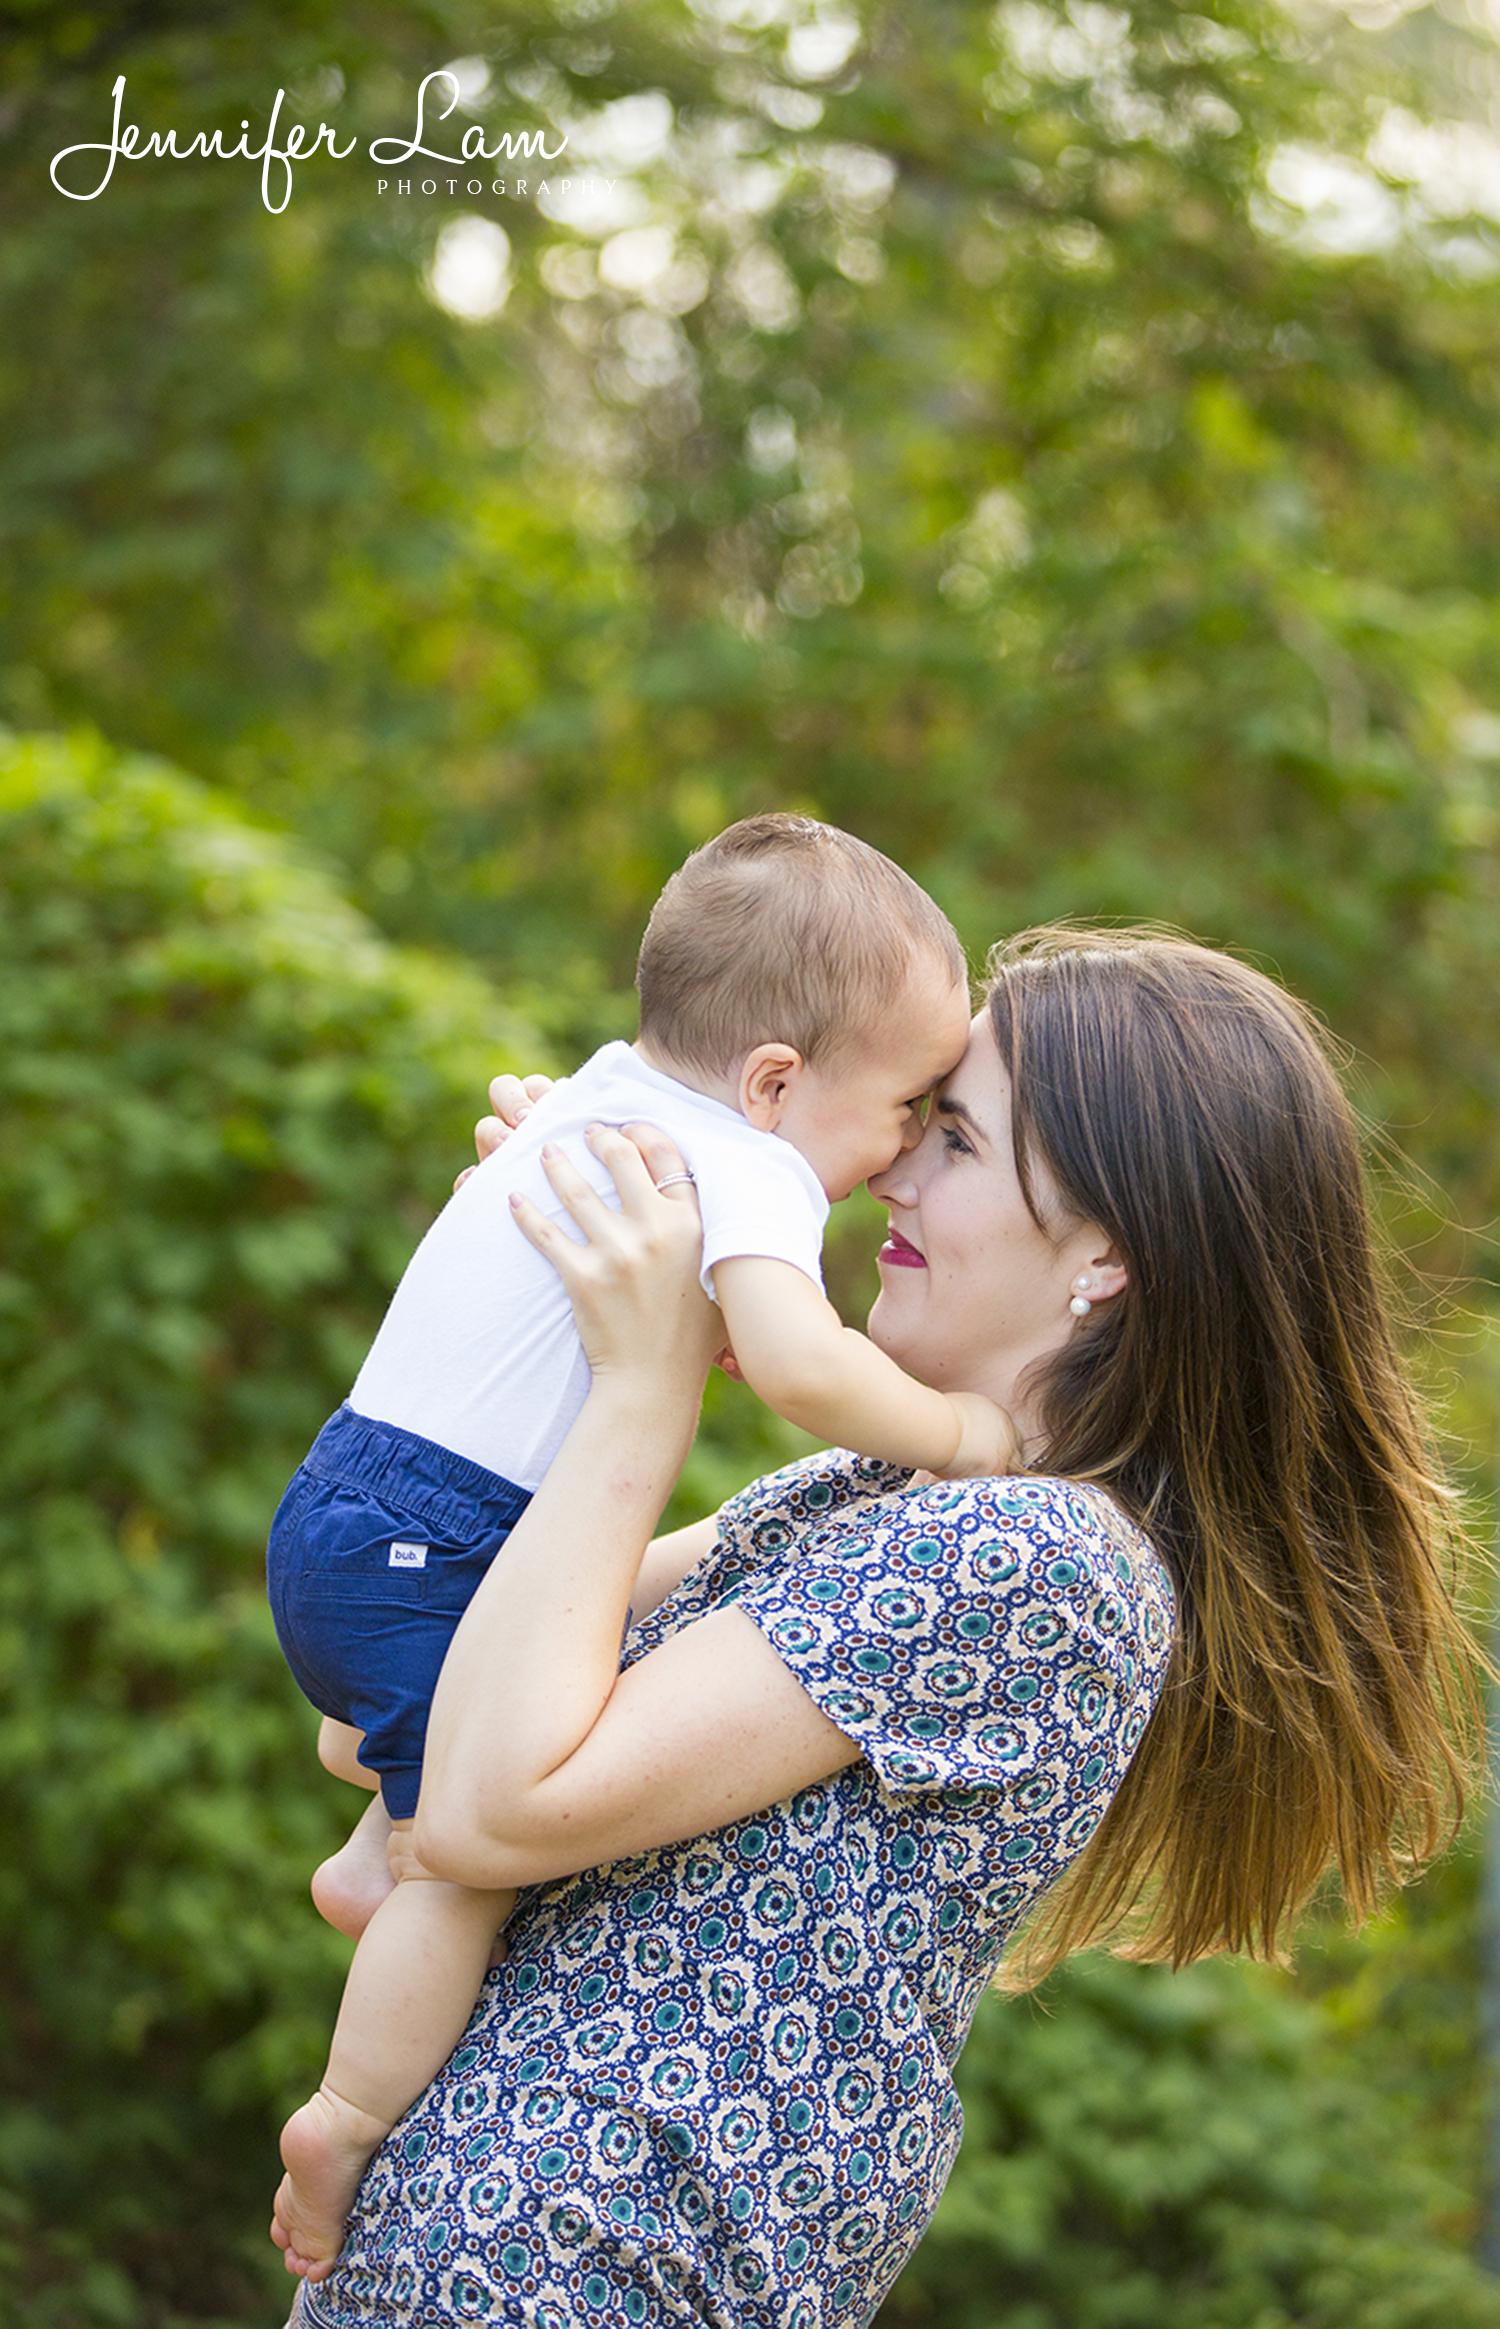 First Birthday - Sydney Family Portrait Photography - Jennifer Lam Photography (21).jpg